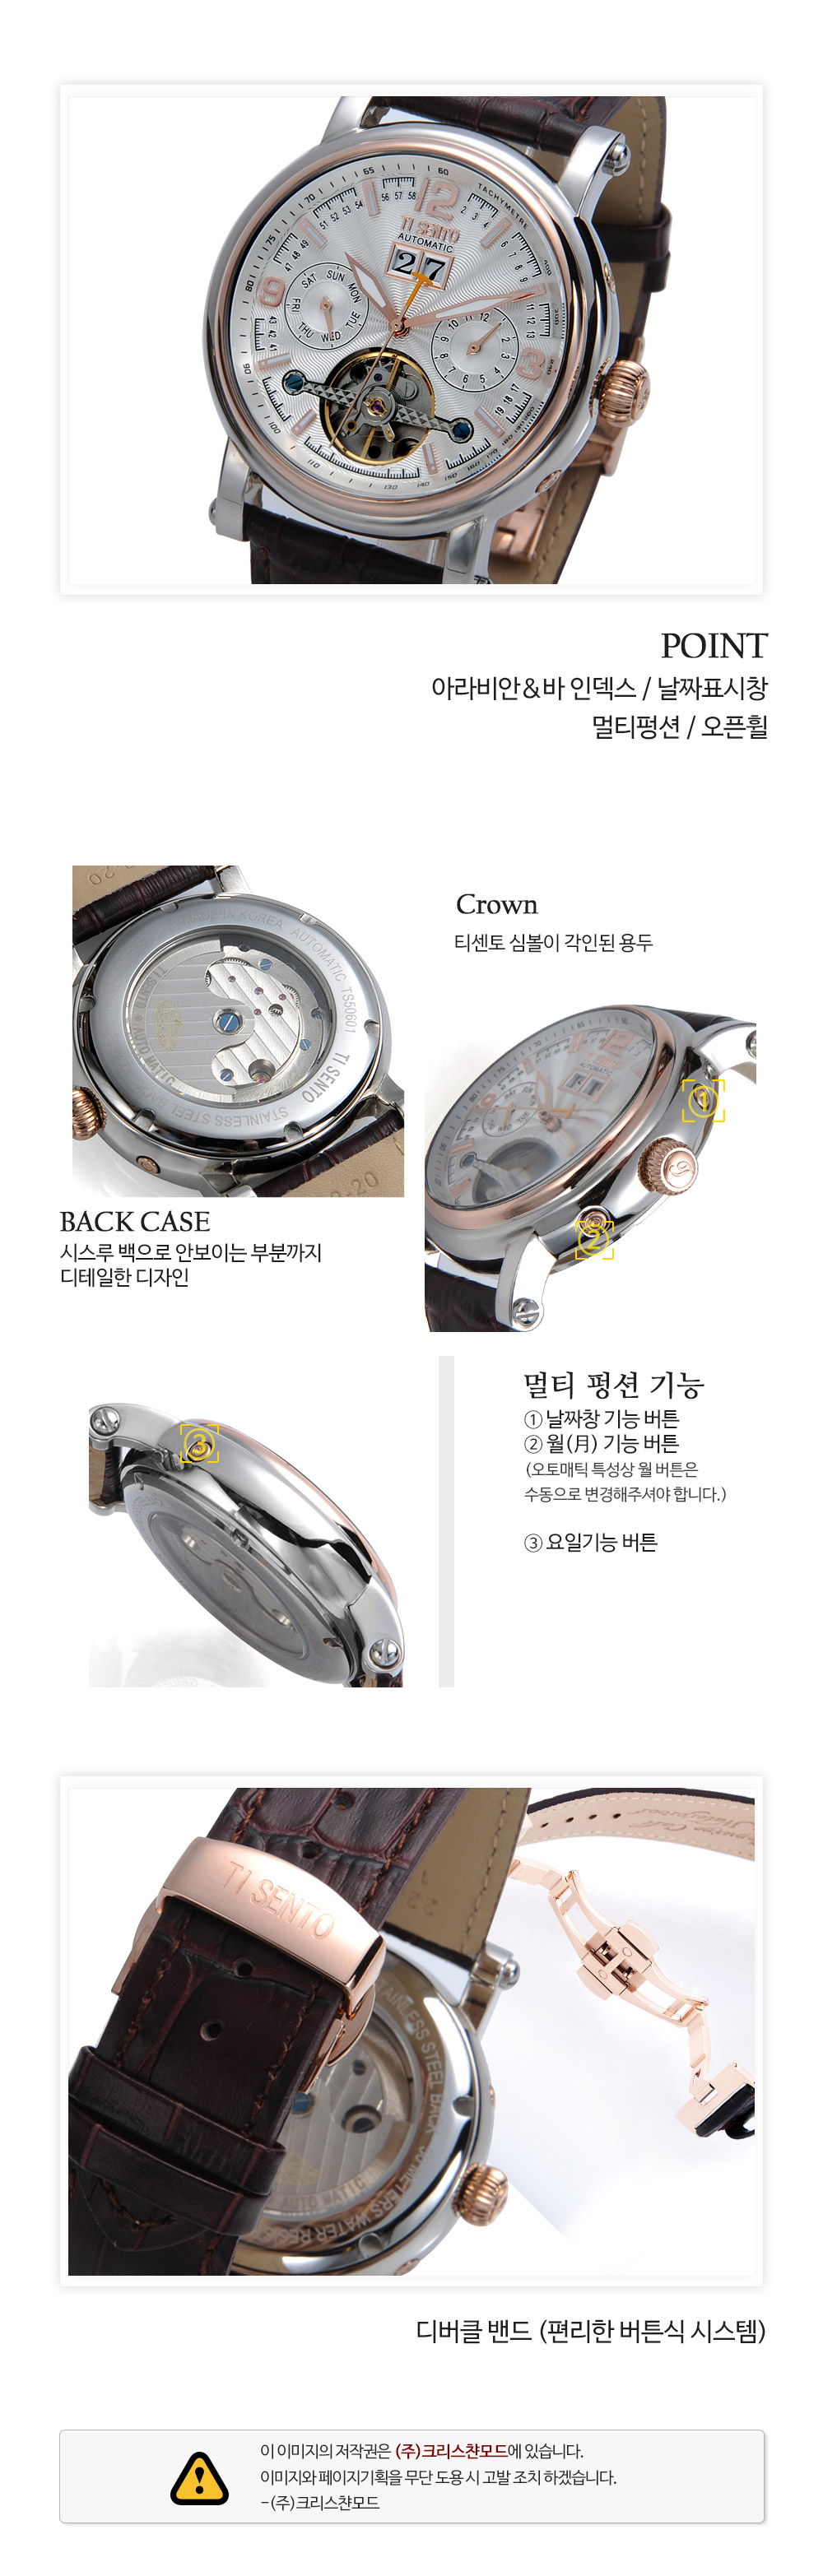 [ TISENTO ] 大韩民国提出的高质量自动机械原装正版的小腿防水皮革腕带手表TS 50601·罗克